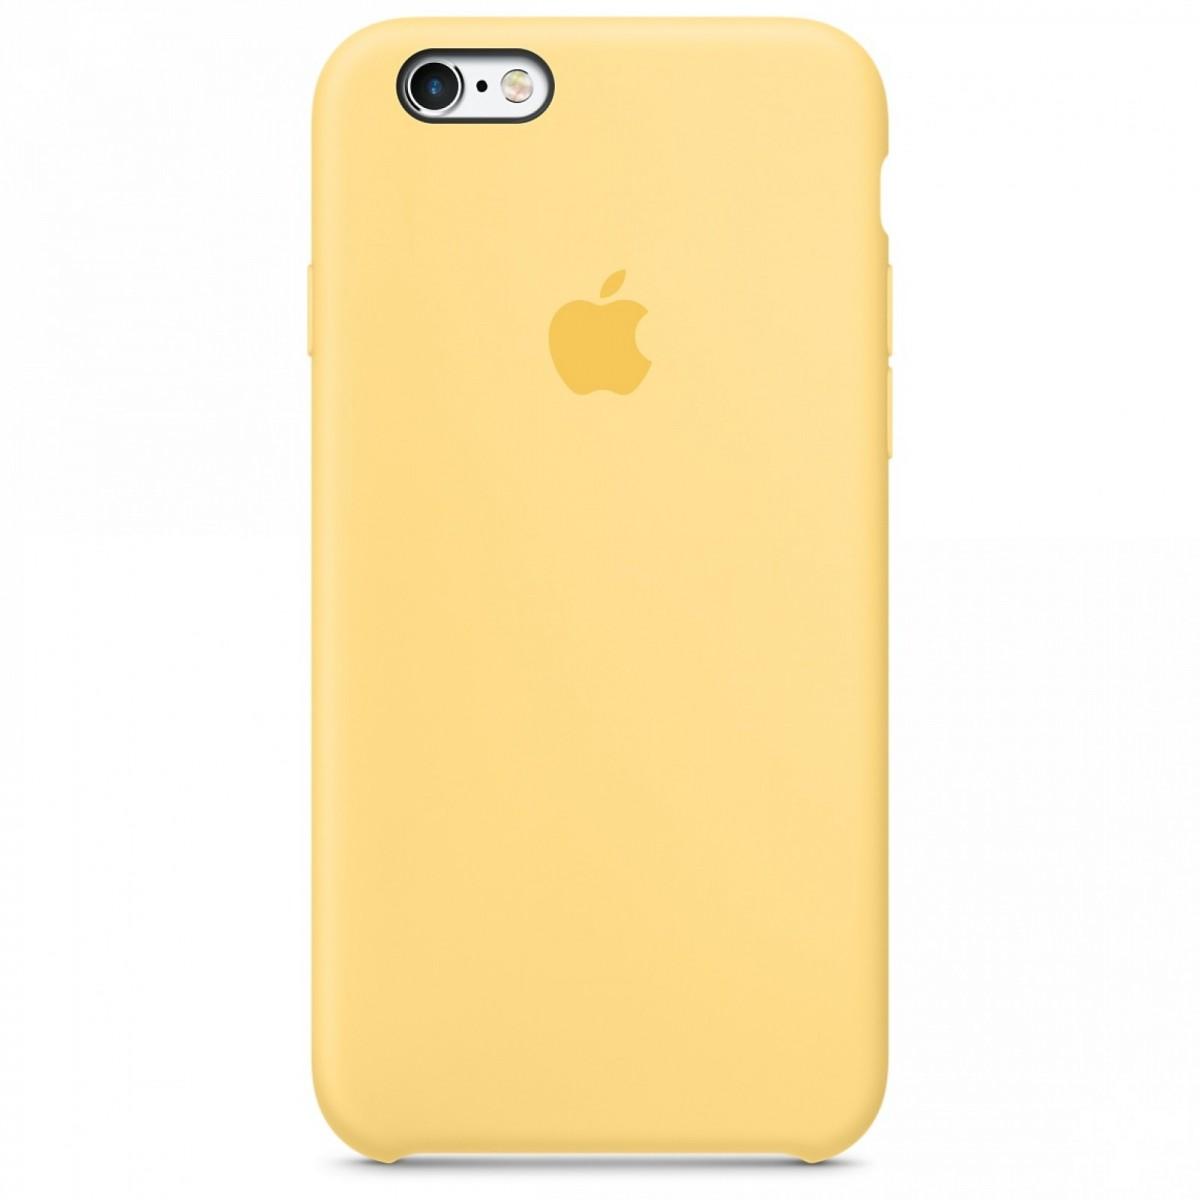 Apple silikonovy kryt pro iphone 6 6s sedy - Cochces.cz 79430b45061